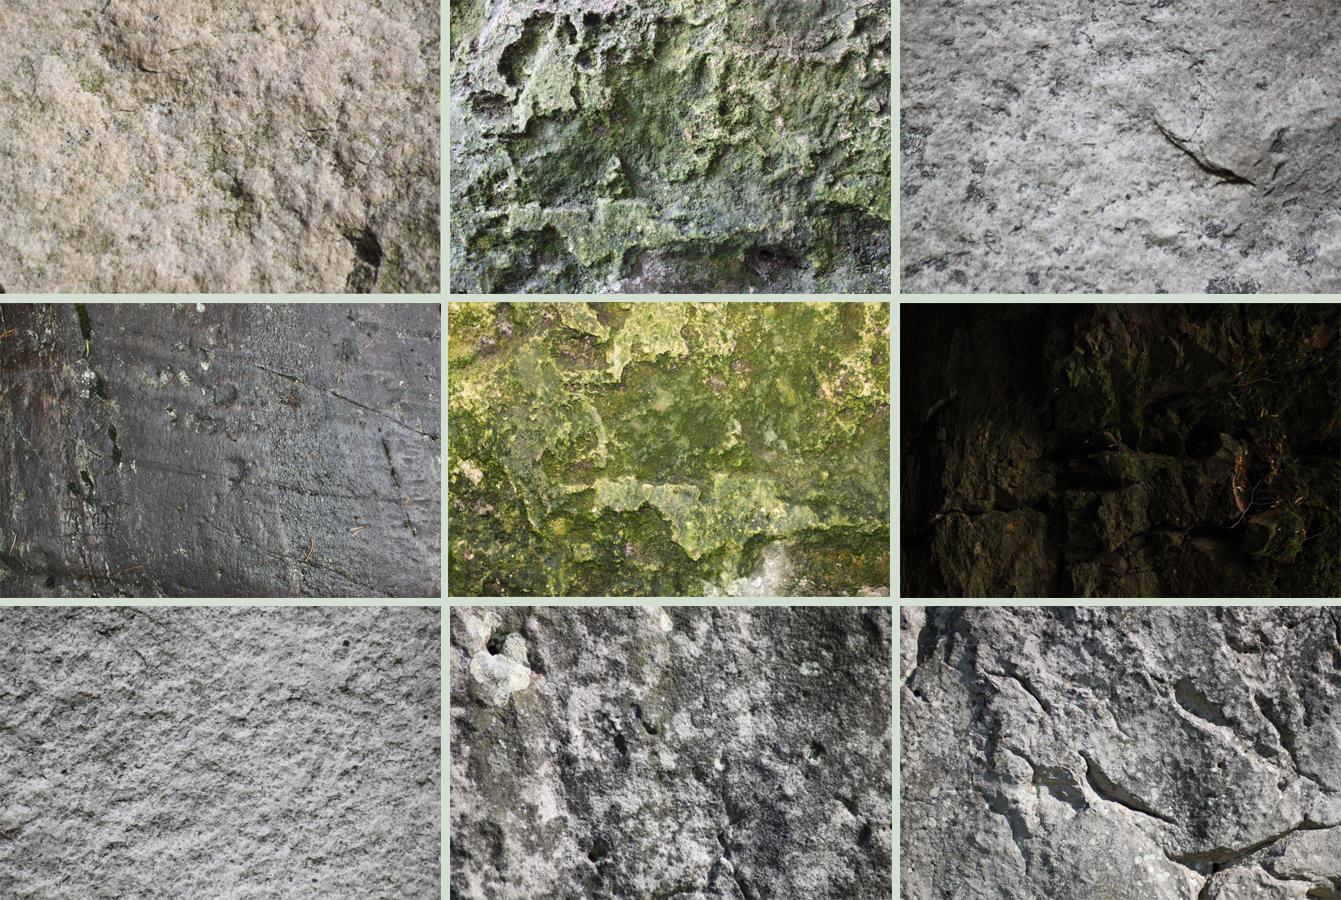 Stone Texture 3 by Tasastock